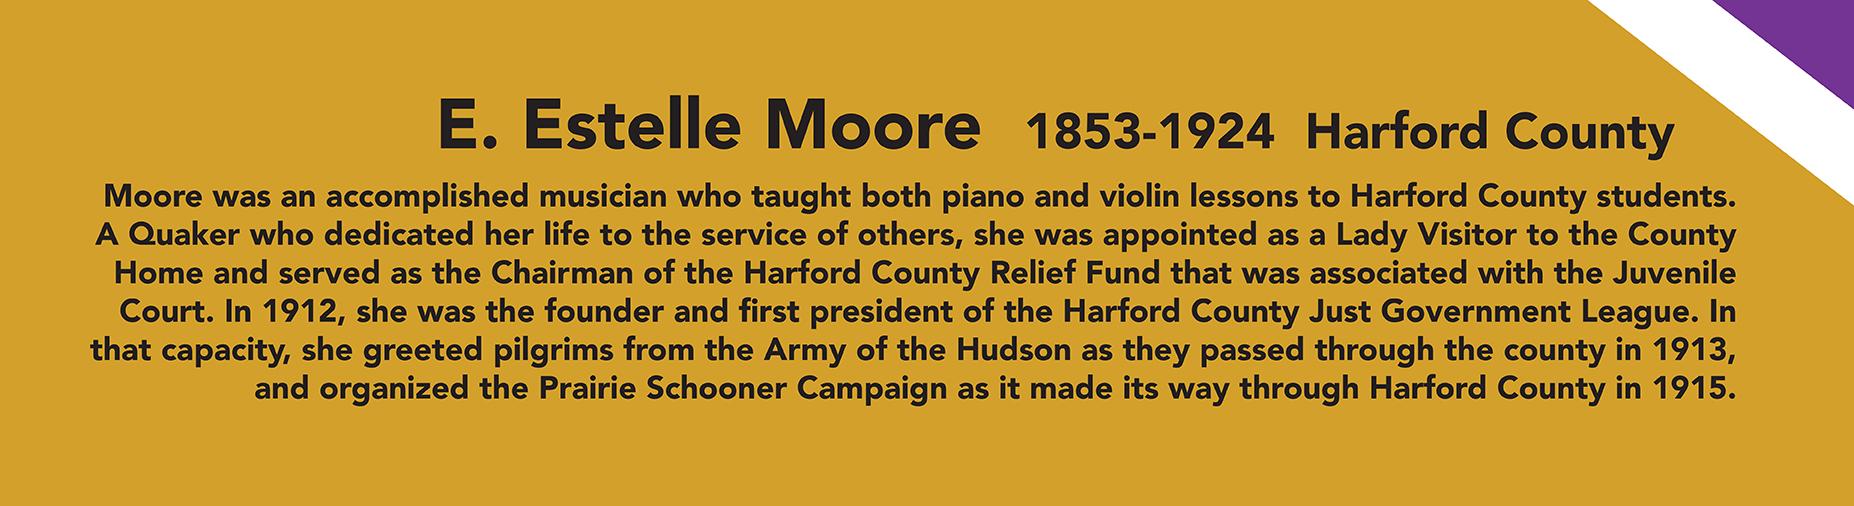 E Estelle Moore